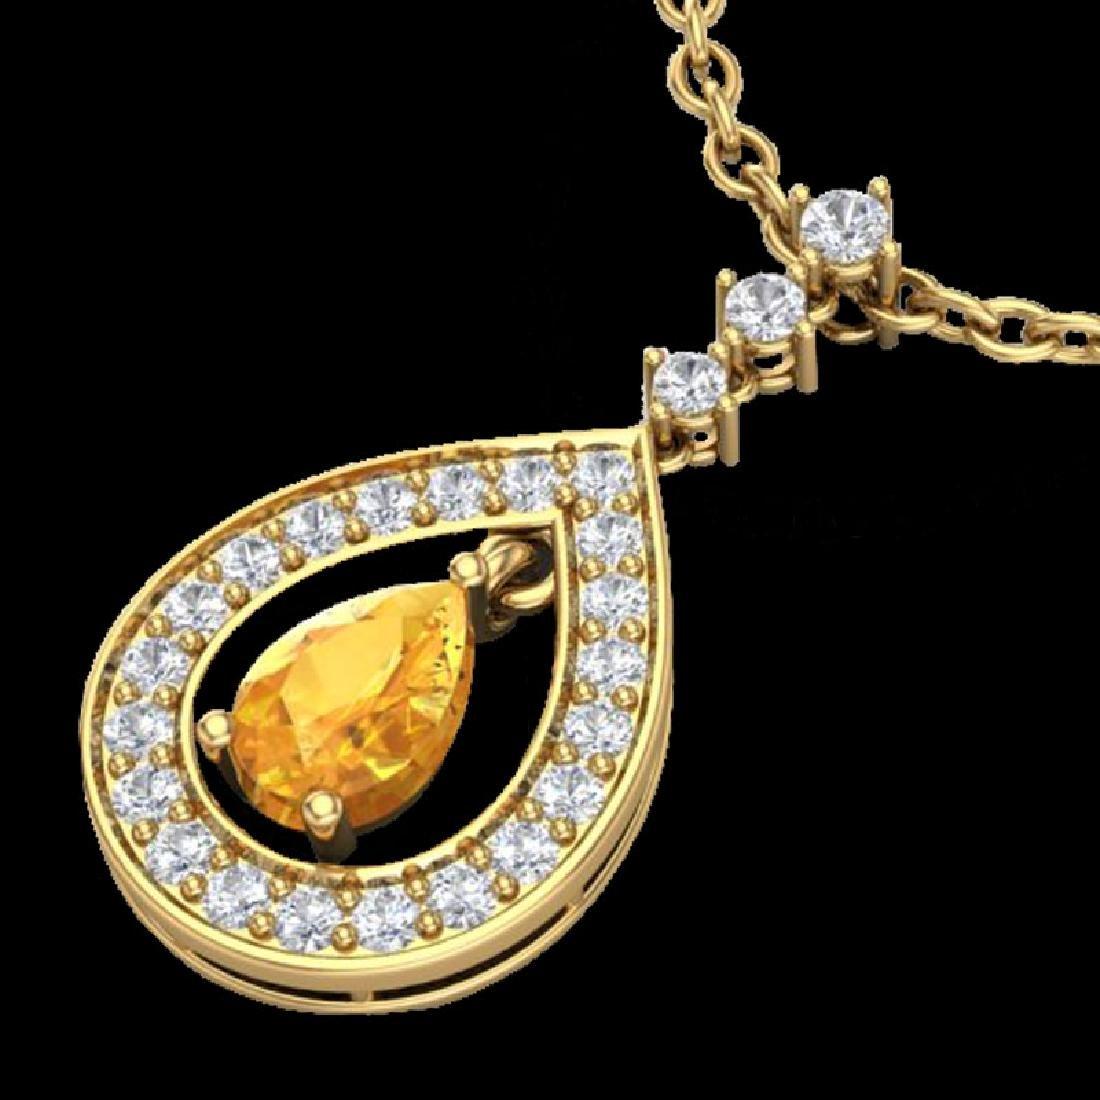 1.15 CTW Citrine & Micro Pave VS/SI Diamond Necklace